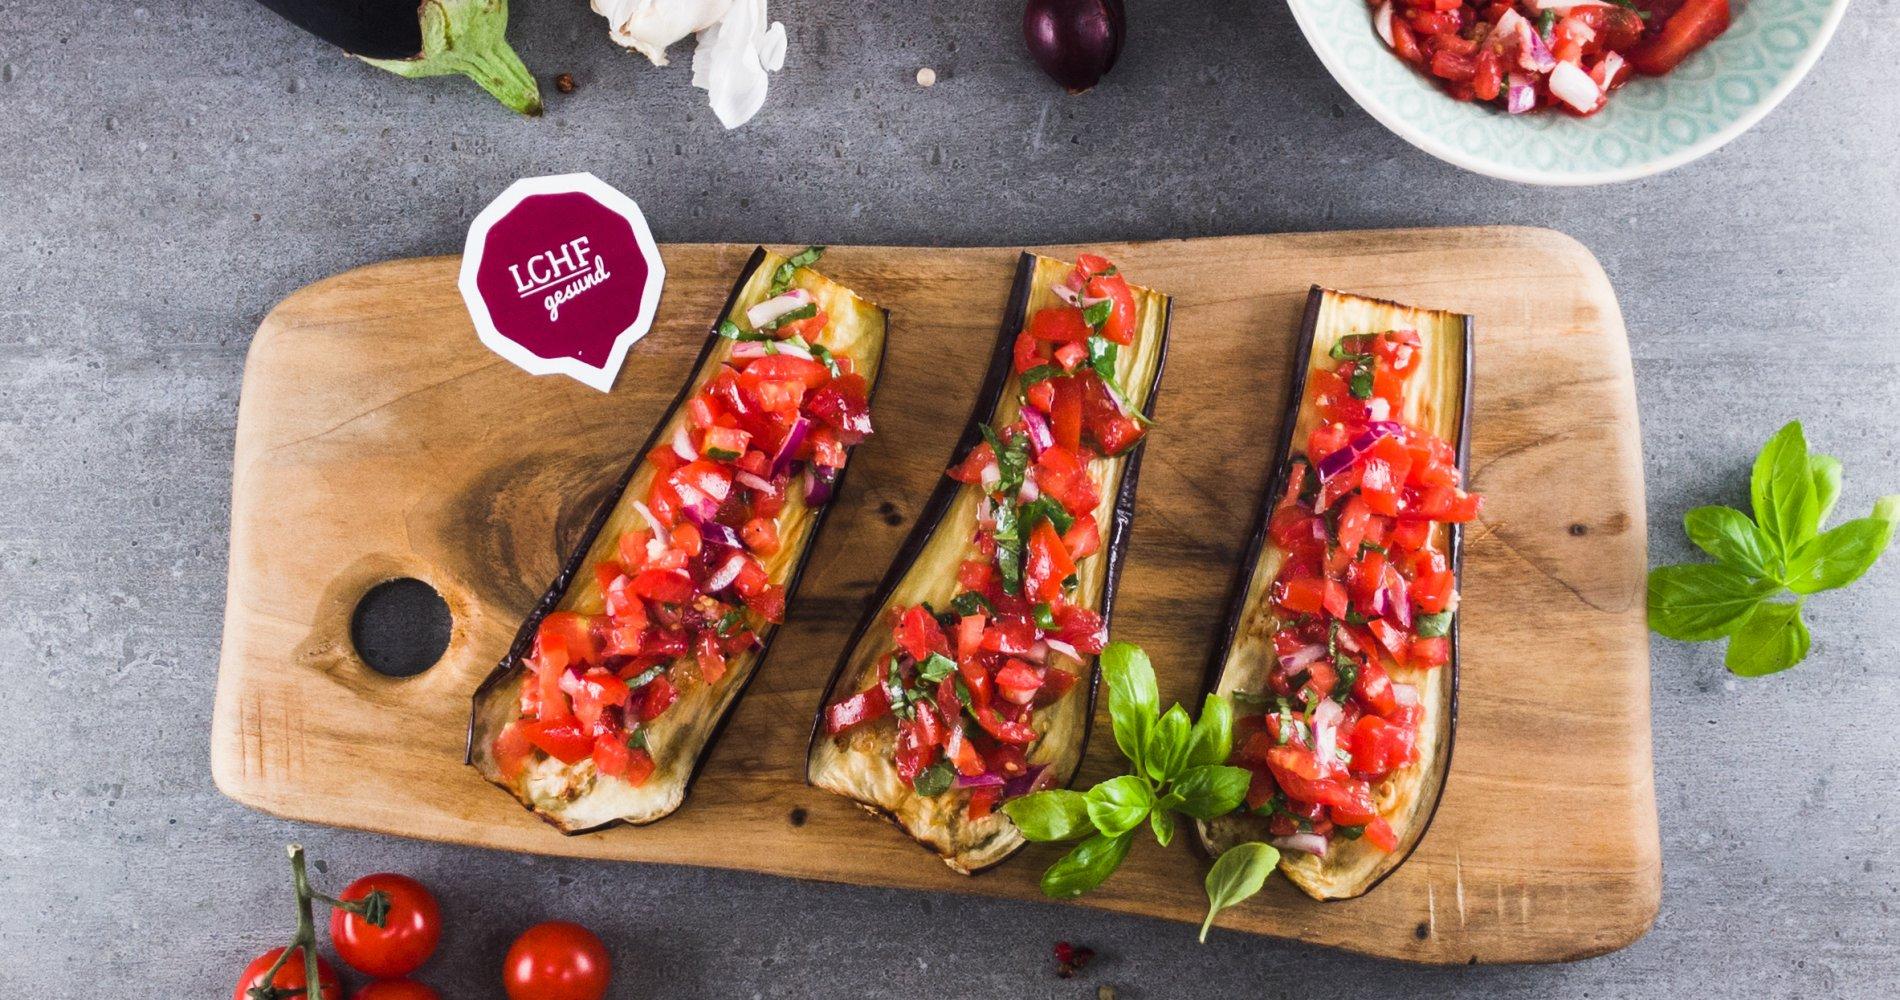 Rezept Low Carb: Auberginen-Tomaten-Bruscetta - LCHF-gesund.de